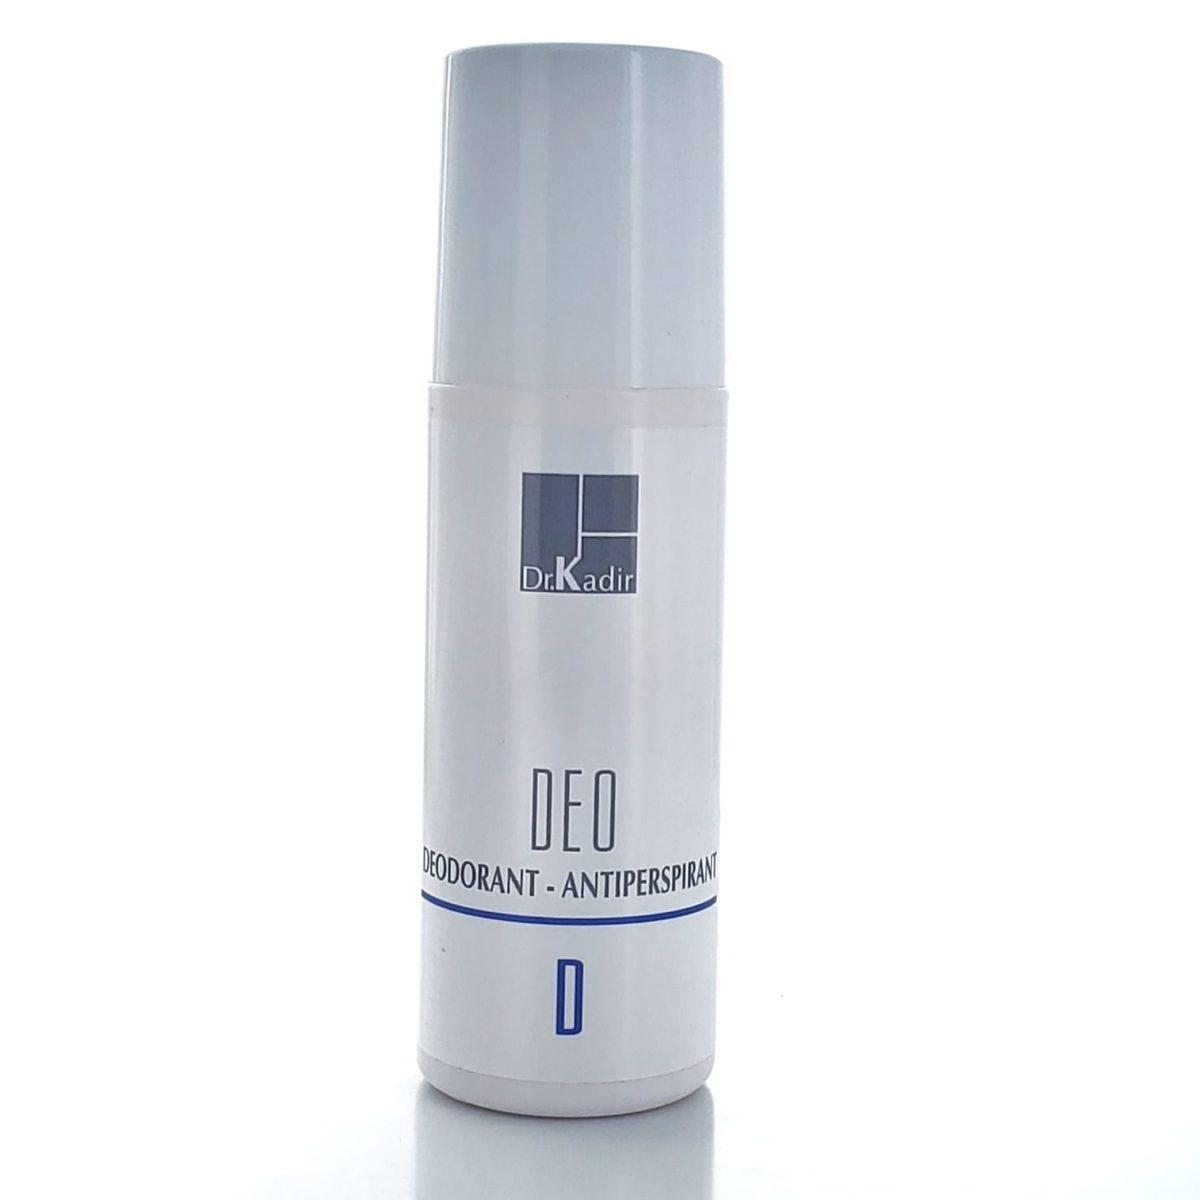 Wheel deodorant